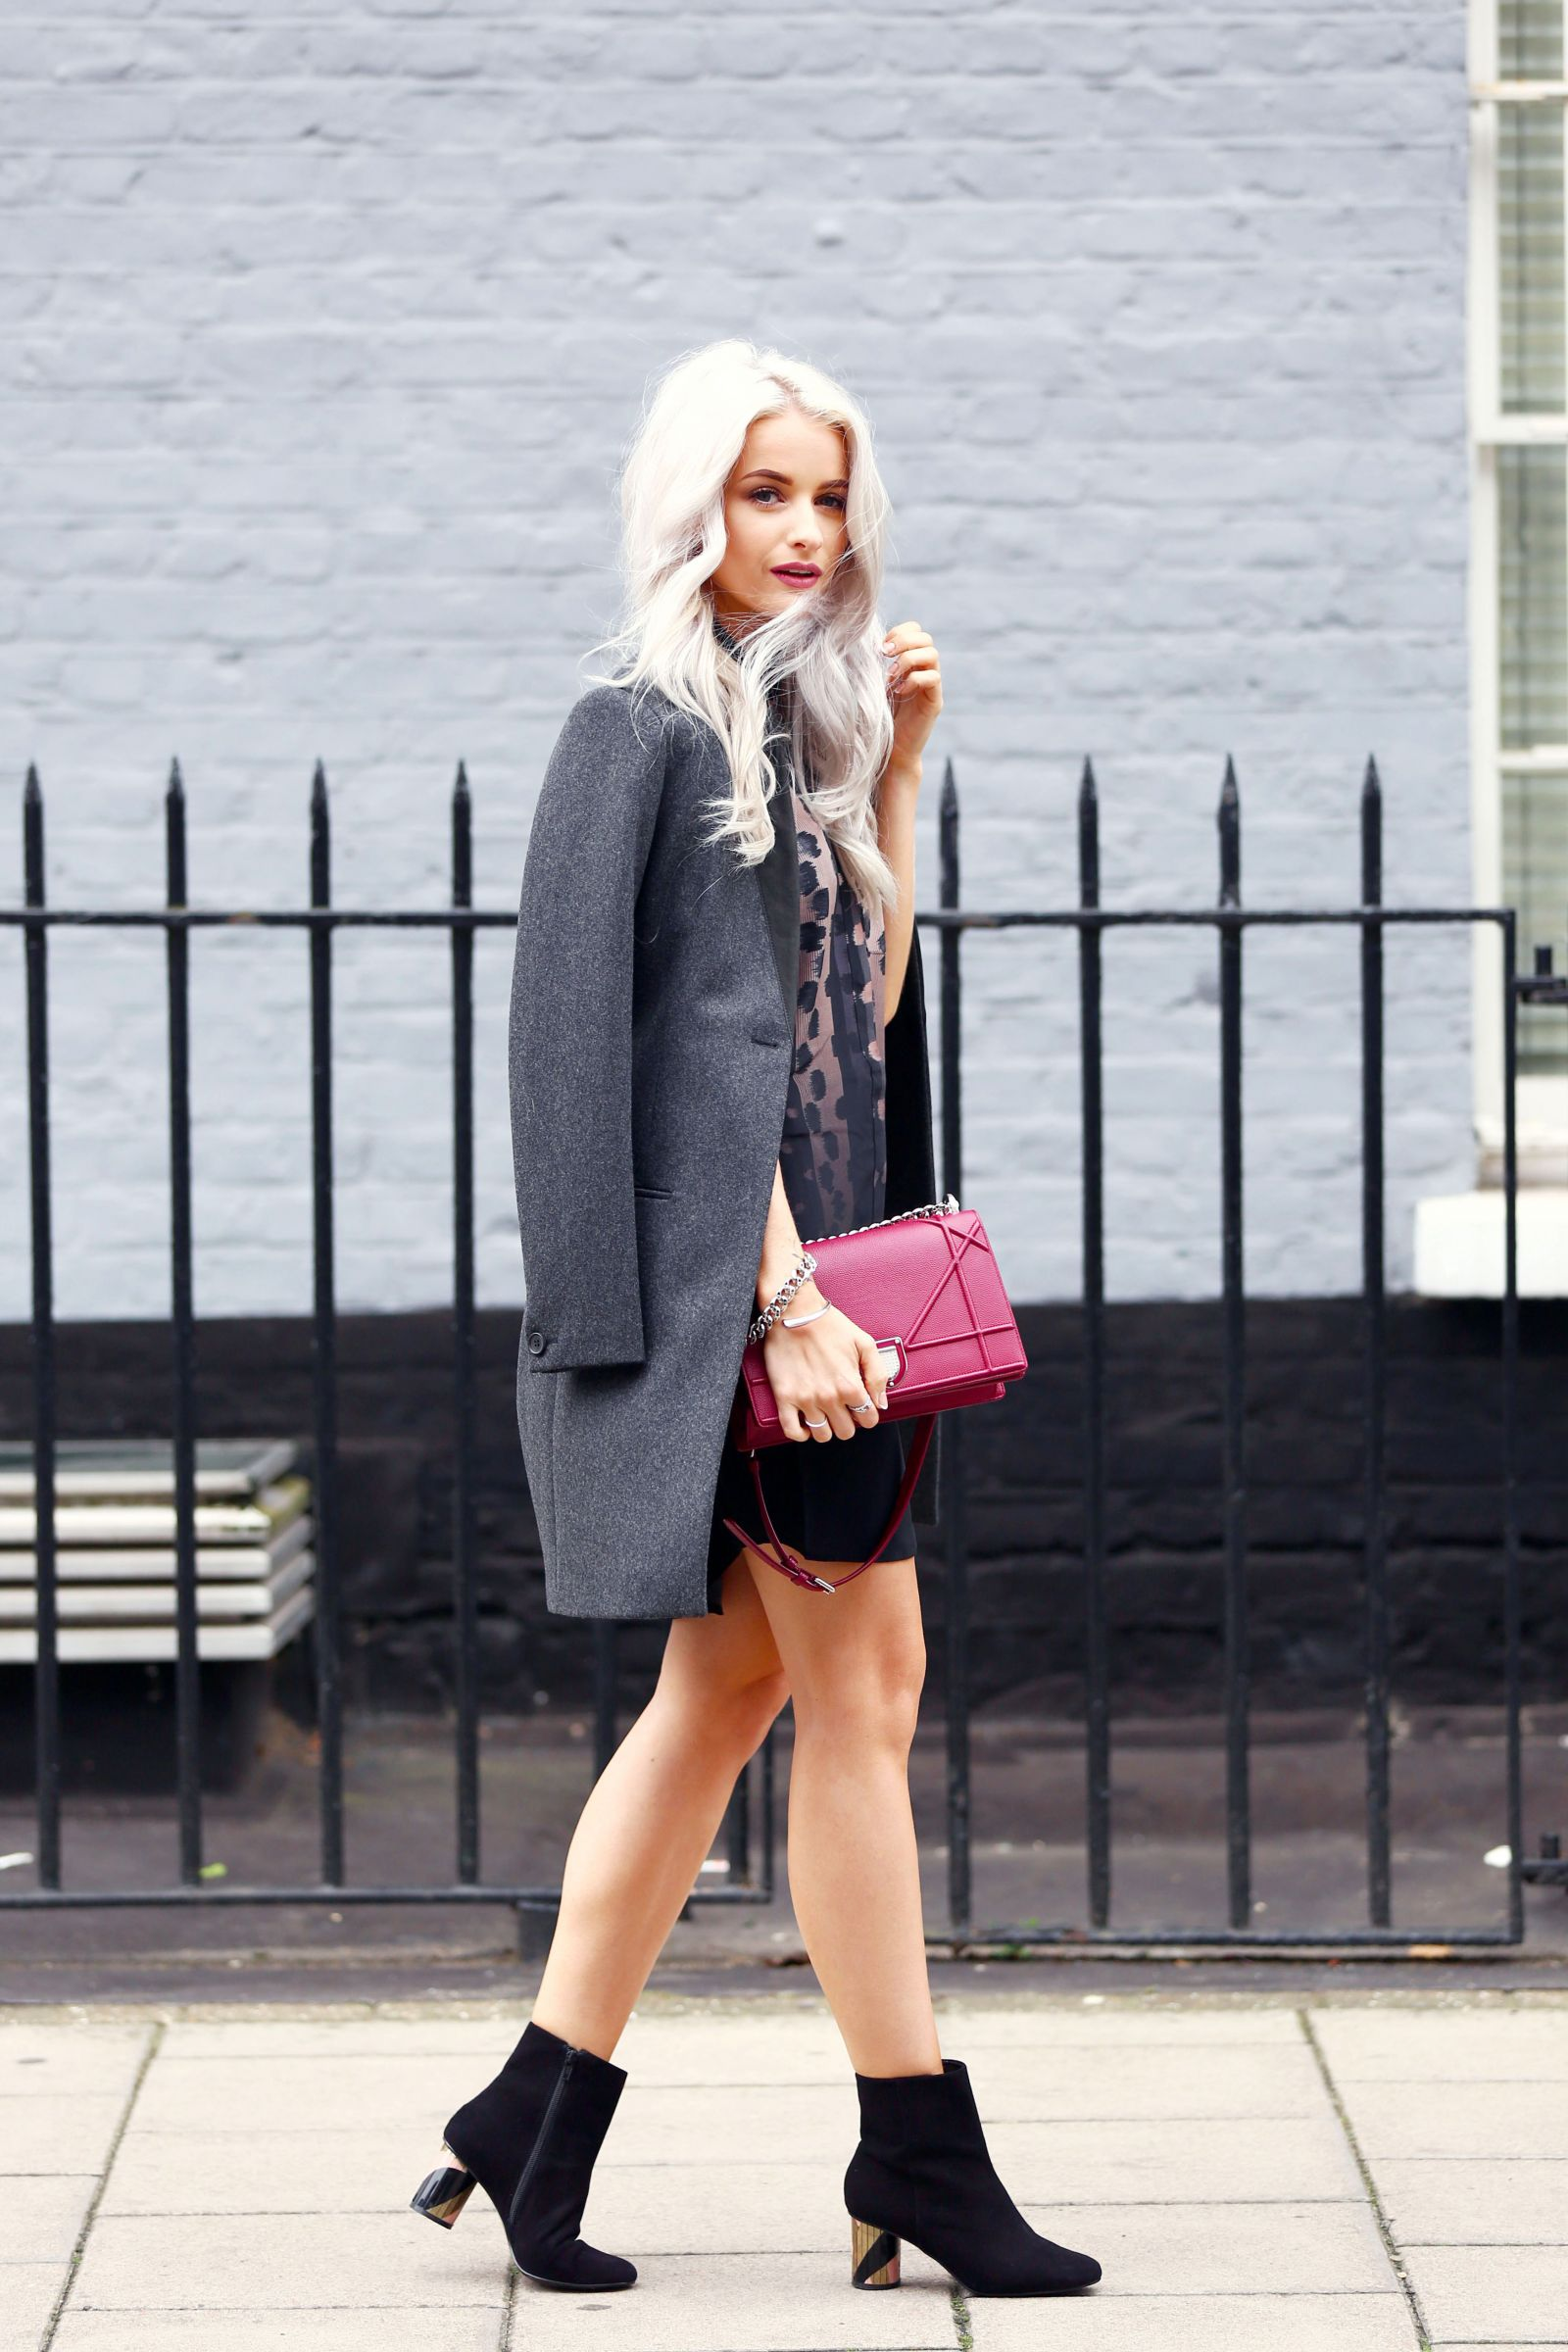 london-fashion-week-inthefrow5